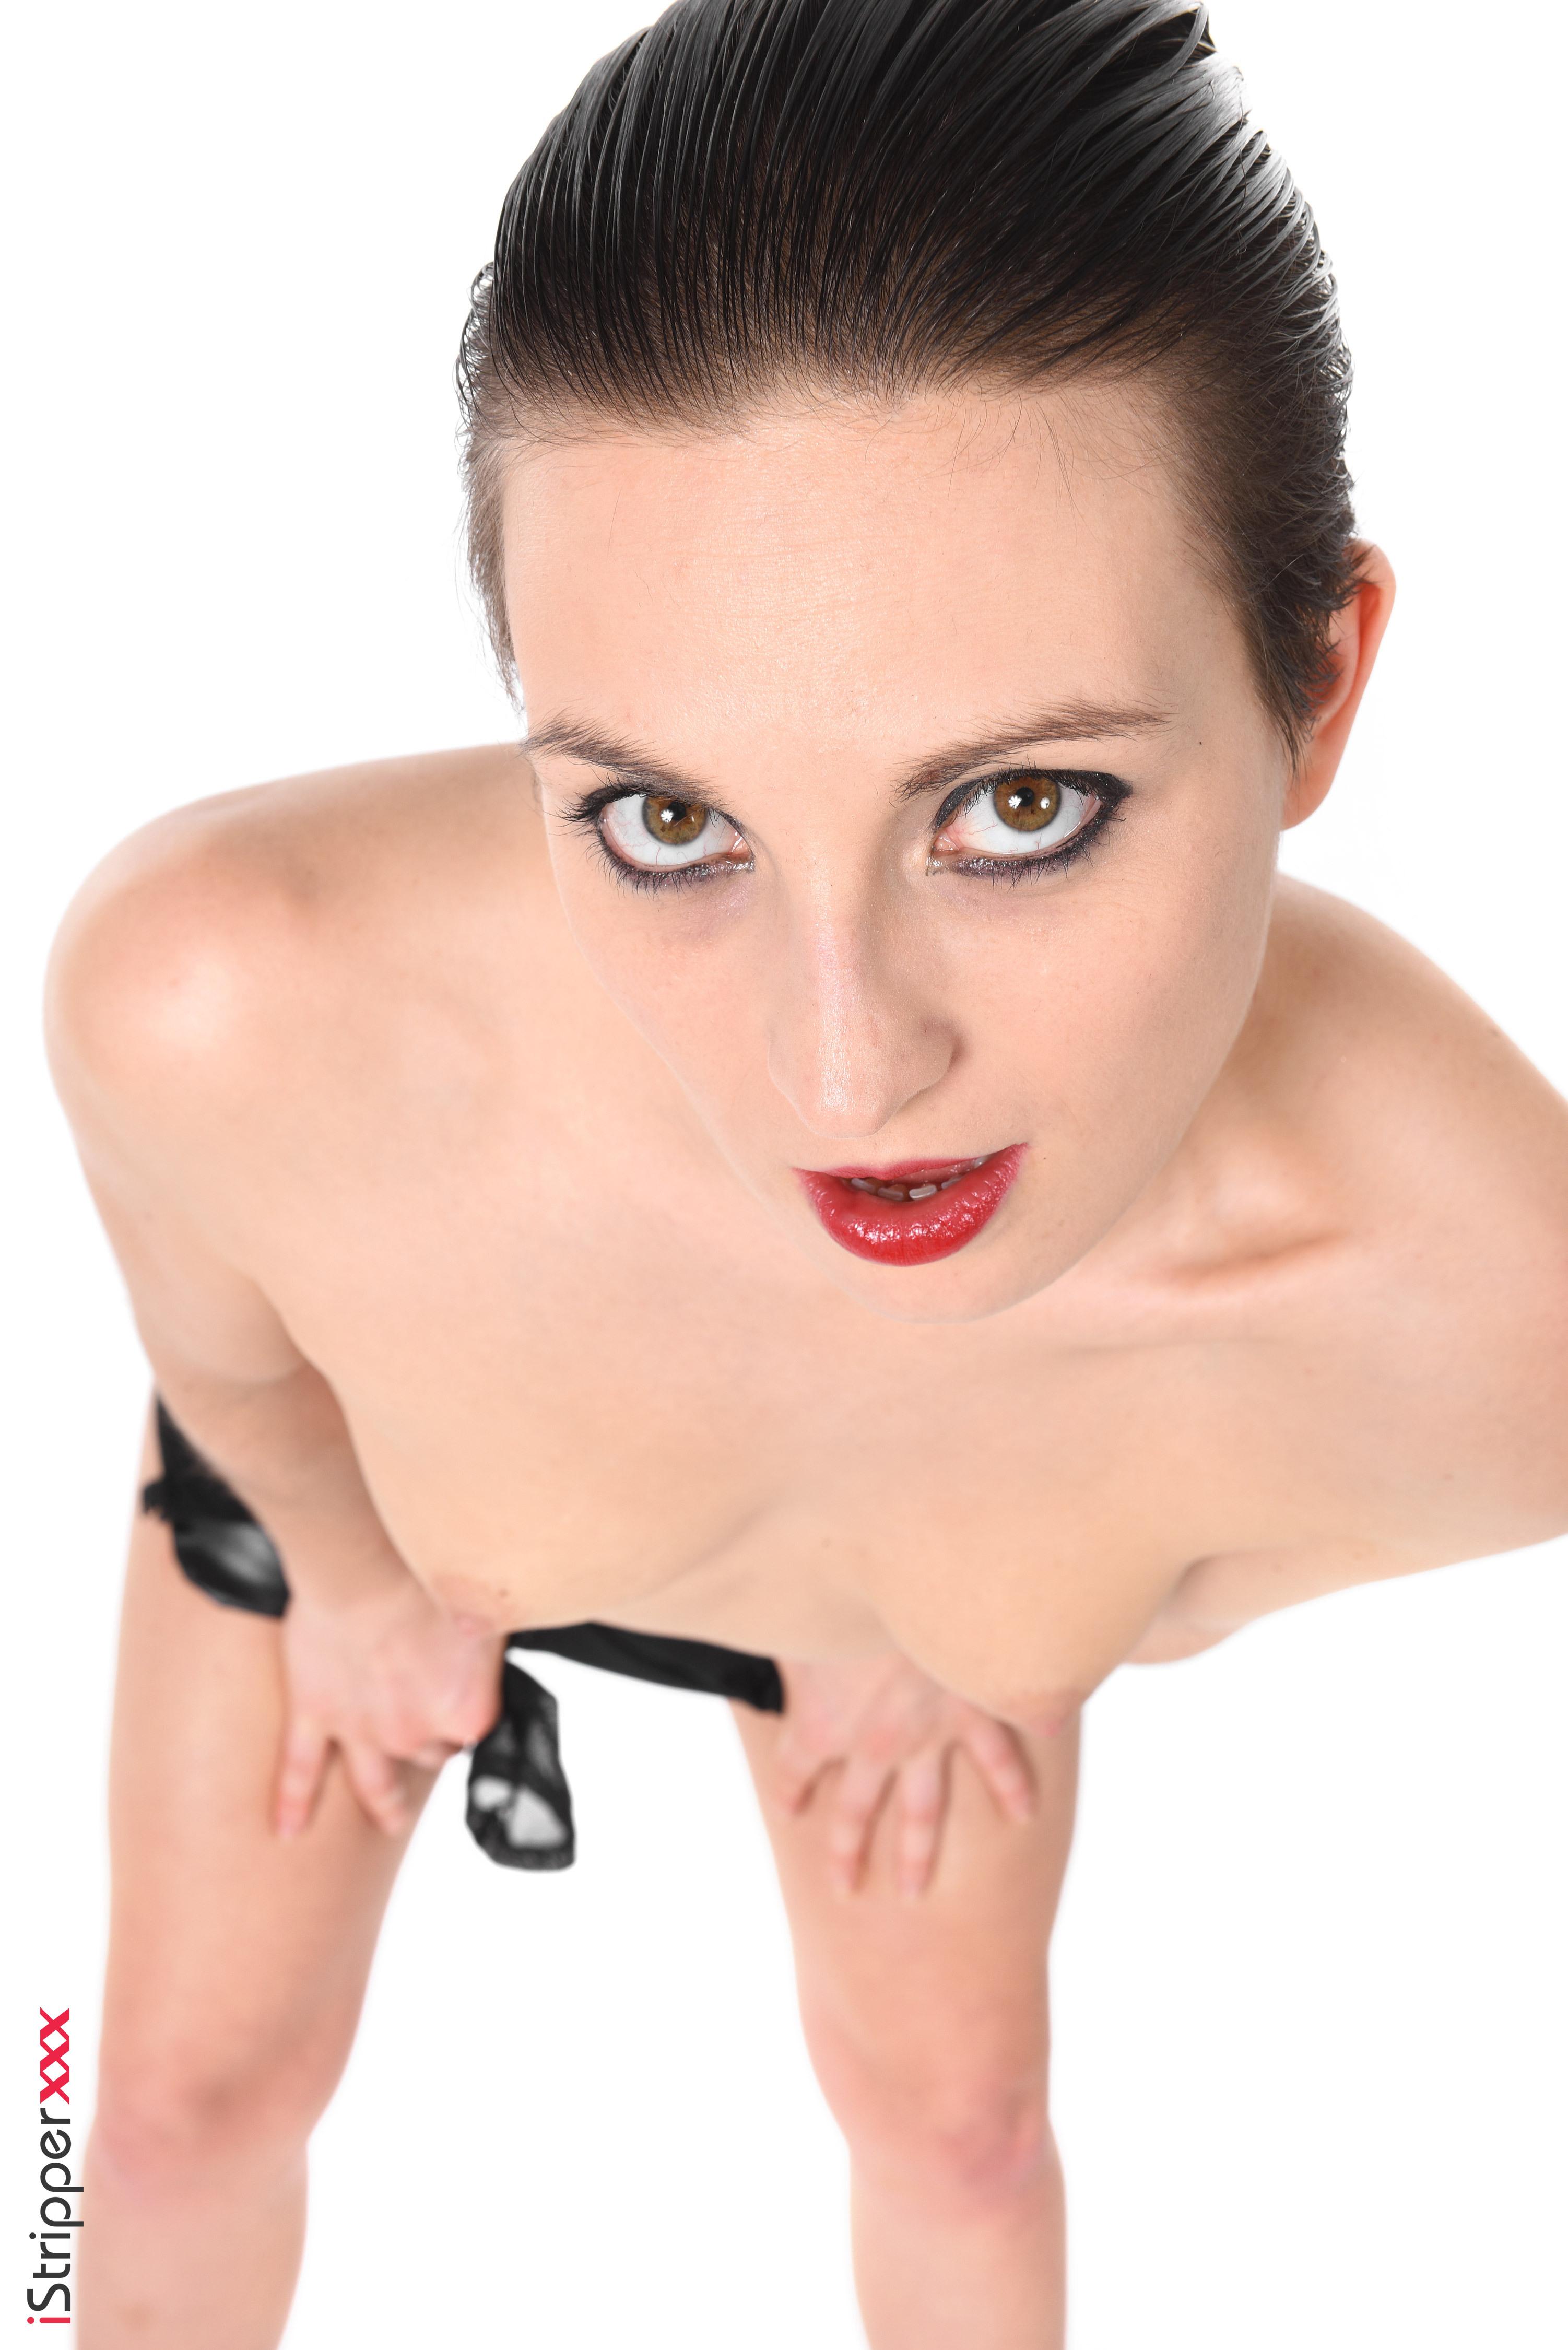 brook little sexy striptease nude